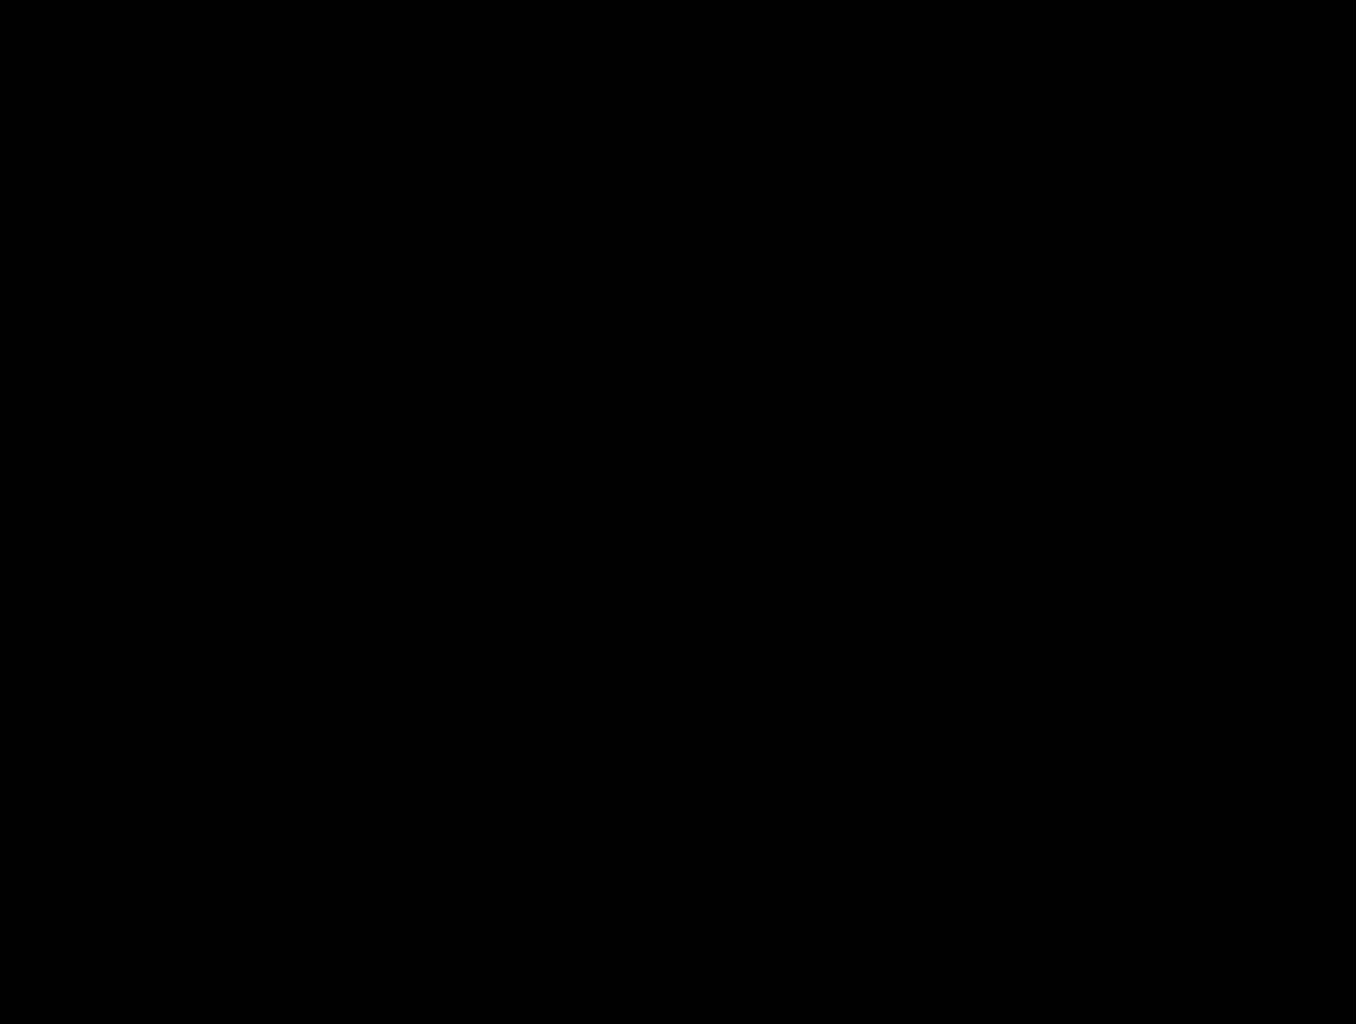 https://eqoxdgod6do.exactdn.com/wp-content/uploads/2021/02/AdobeStock_209180436-scaled-e1612977652658.jpeg?strip=all&lossy=1&w=1920&ssl=1